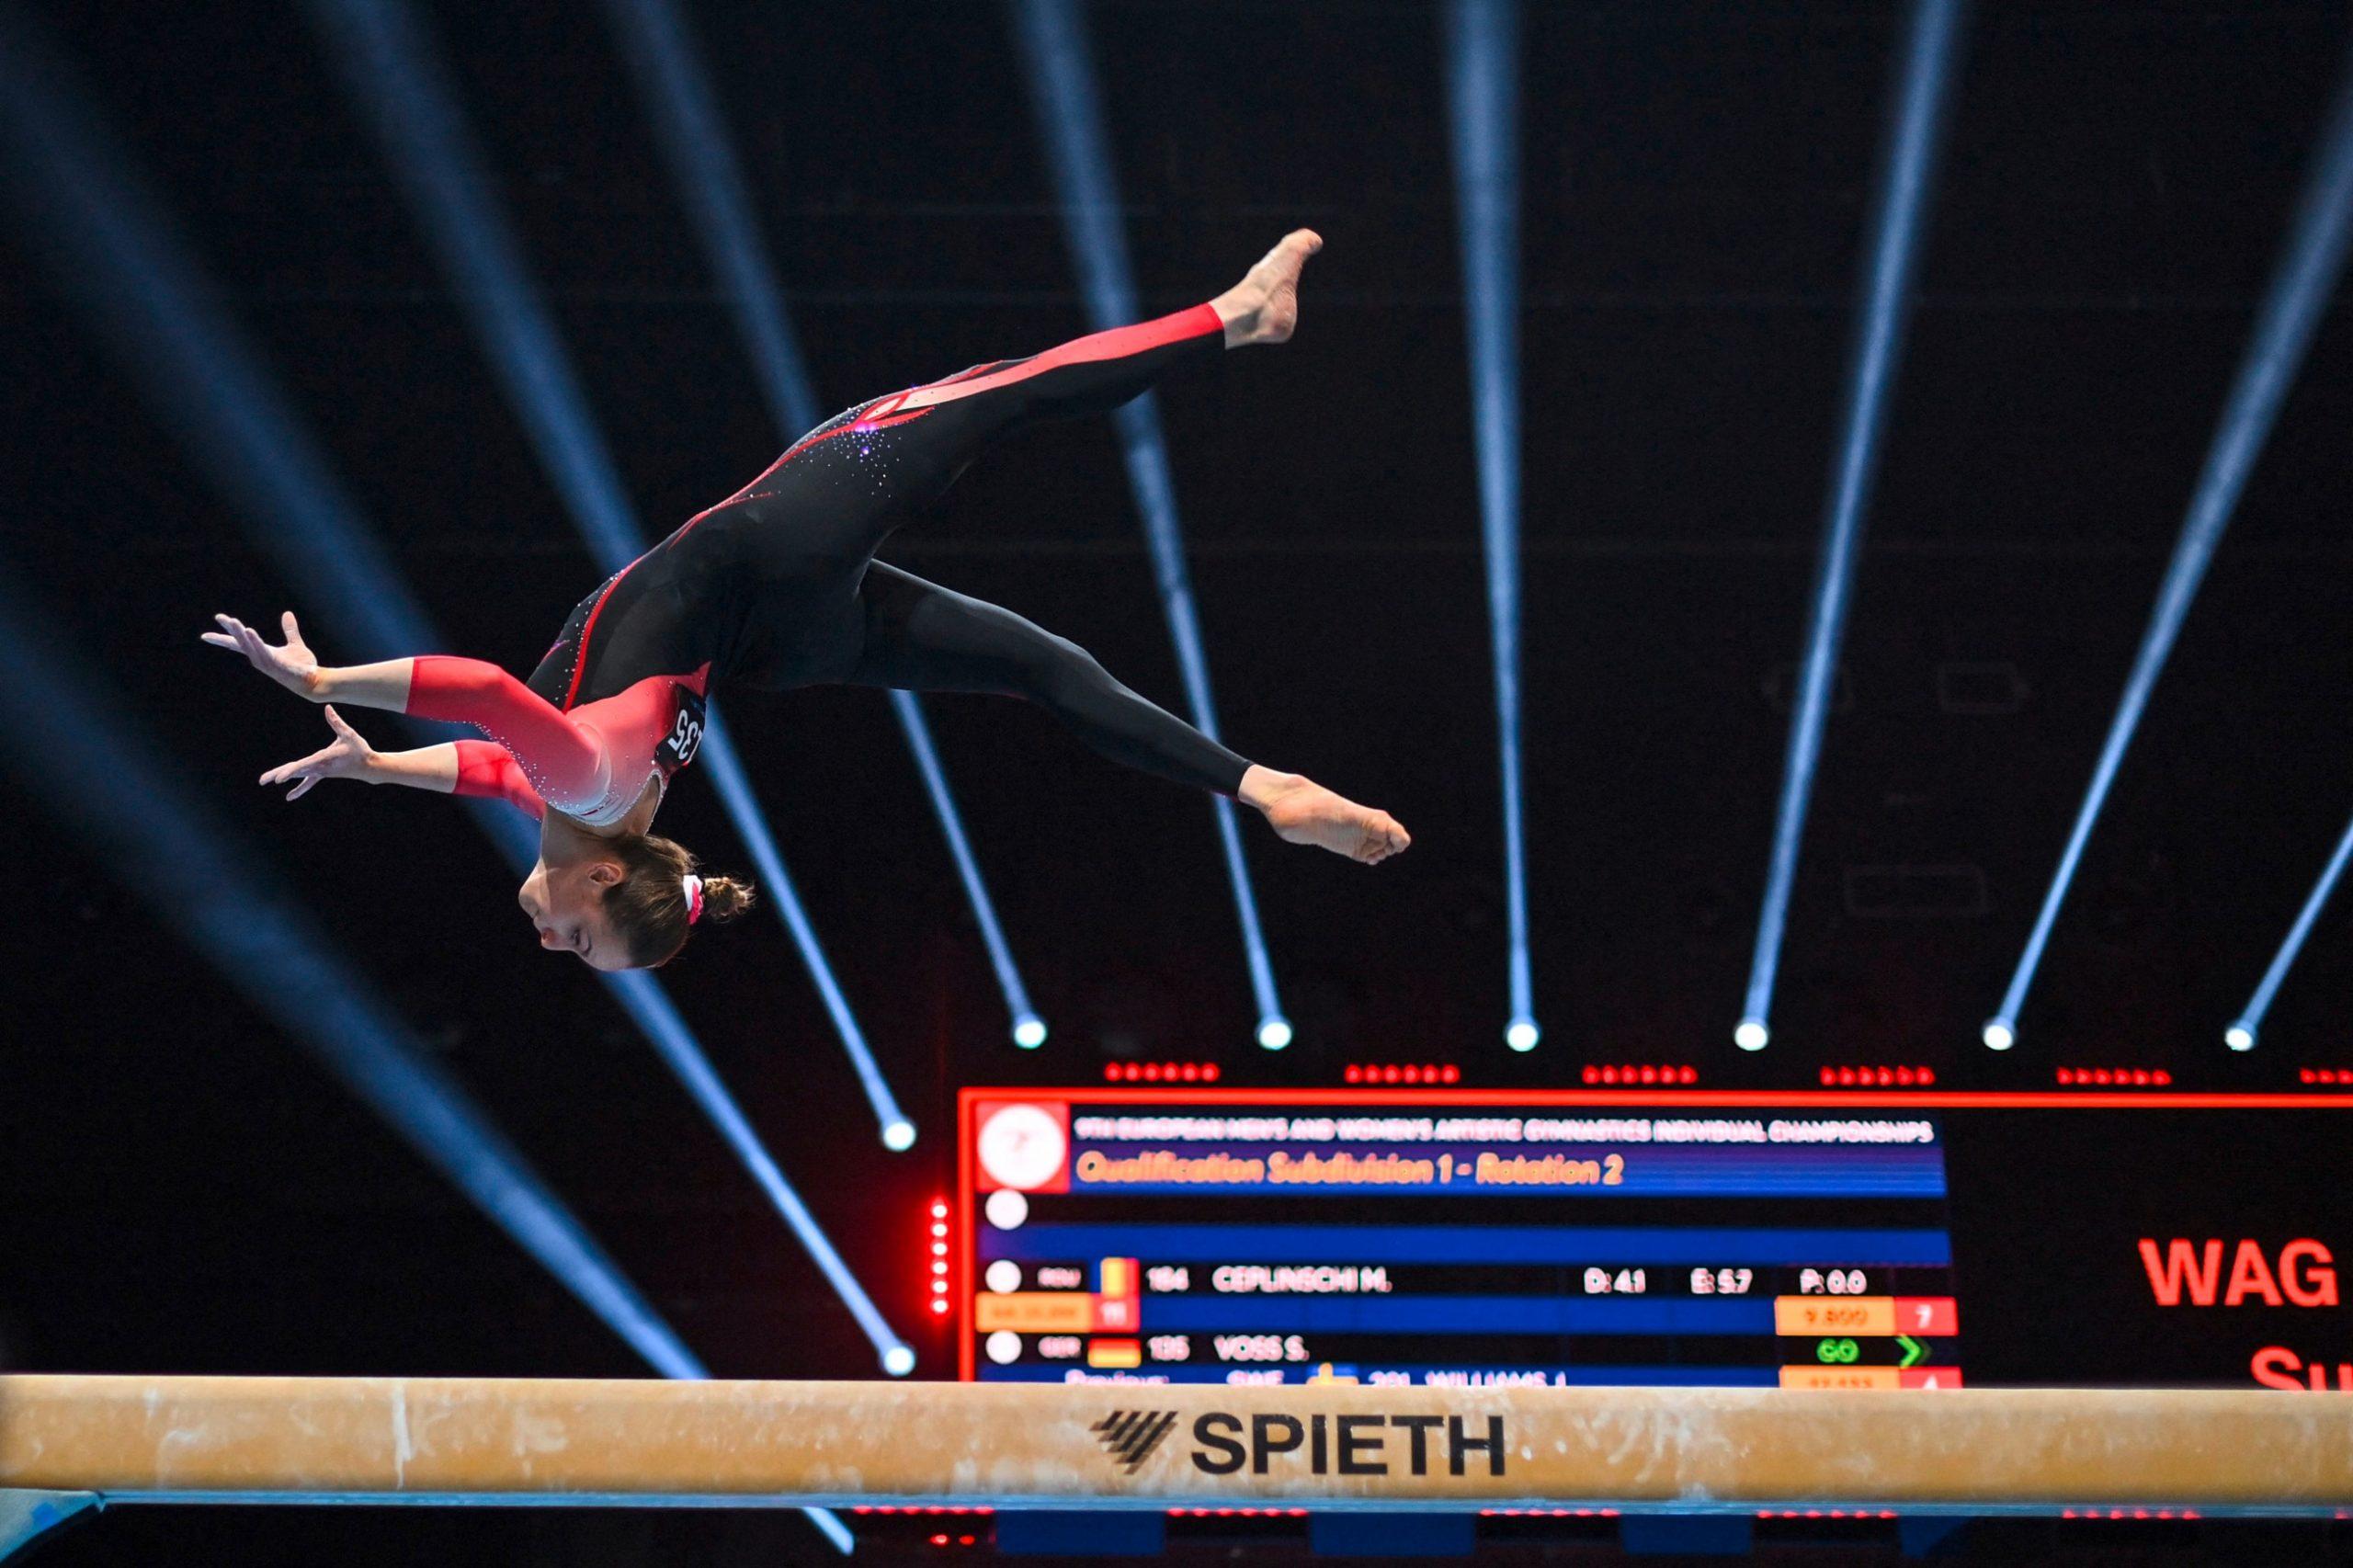 Gymnastikanzug forum